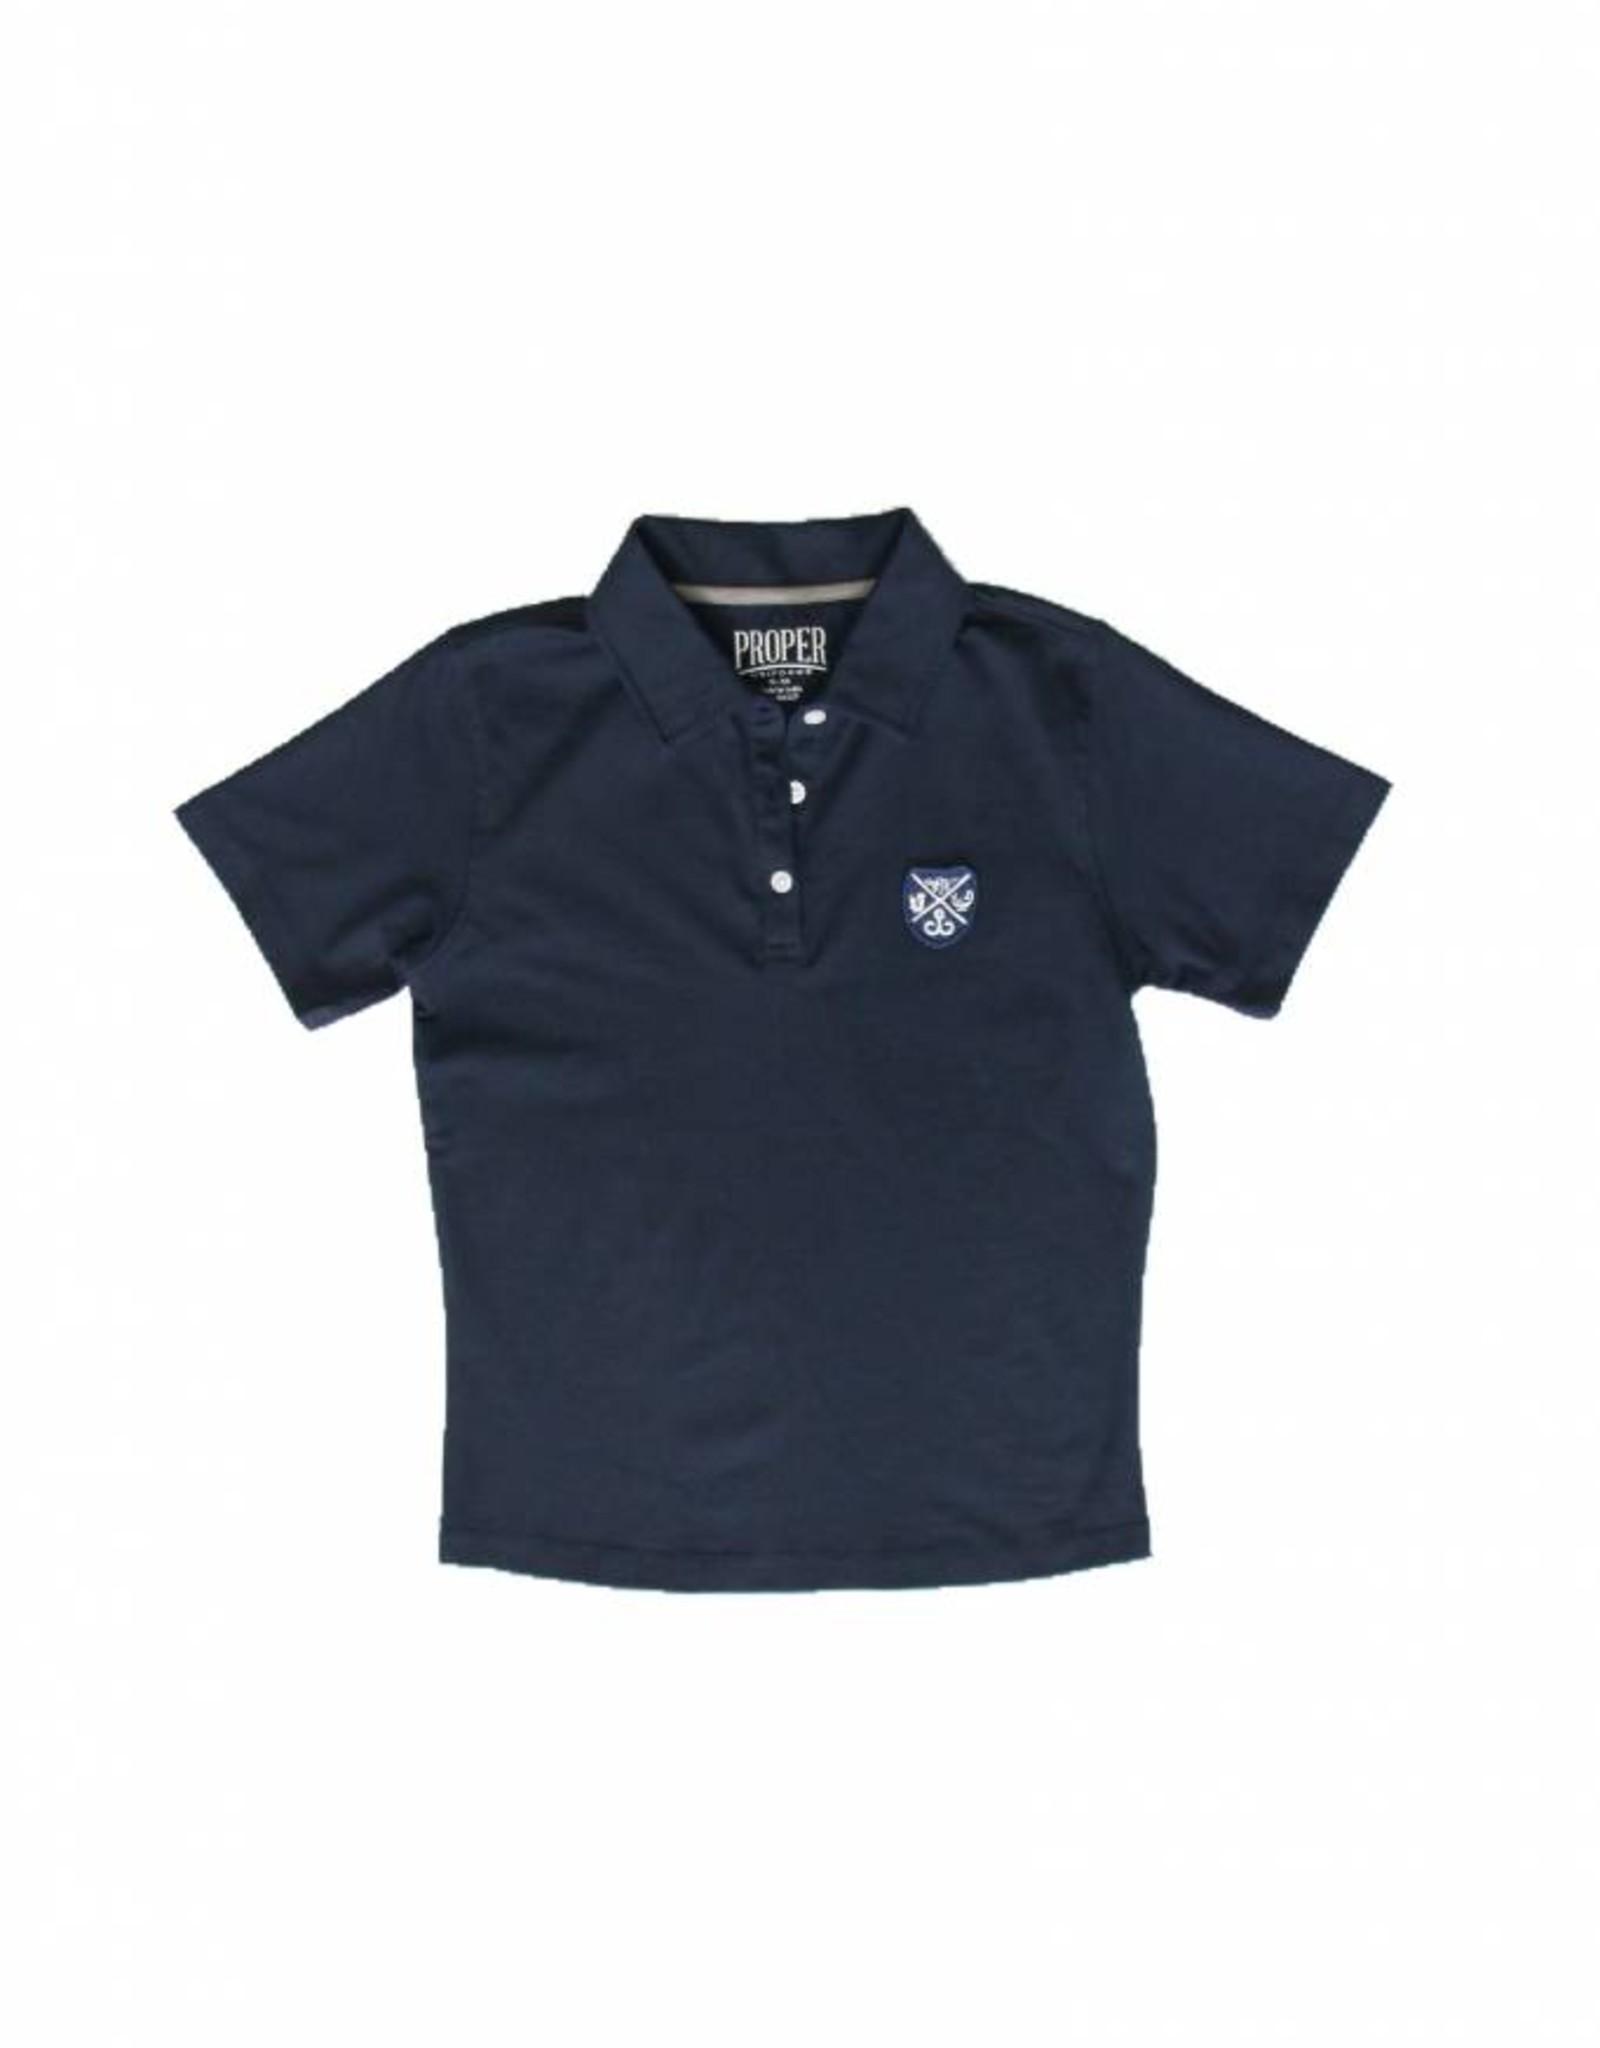 Proper Uniforms SHIRT-3 Button BANDED Adult